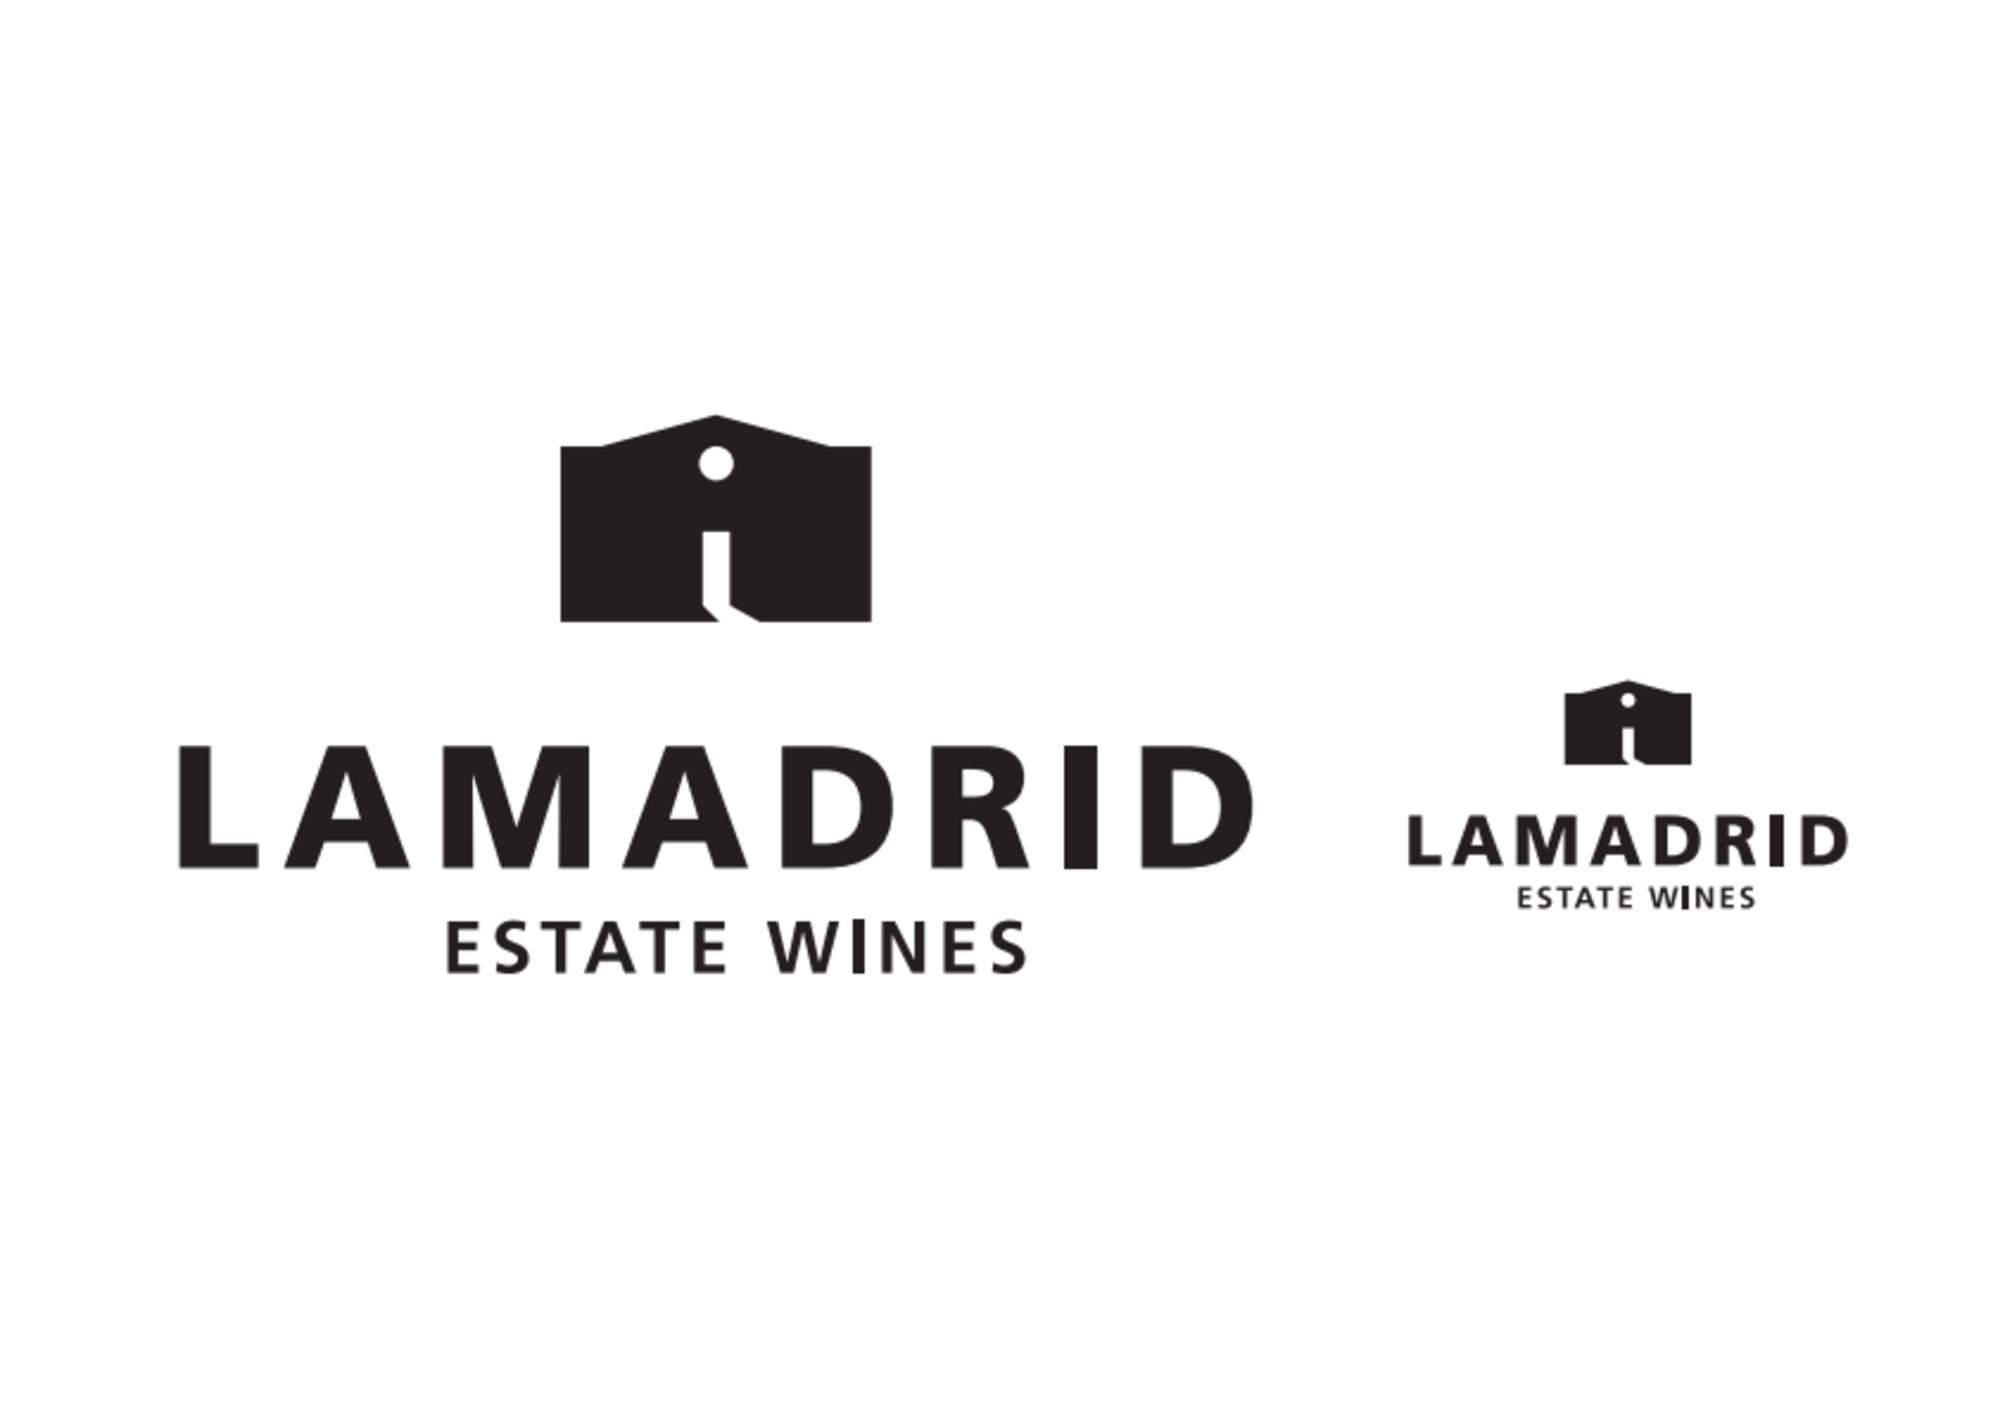 Lamadrid logo nuevo 2015 001